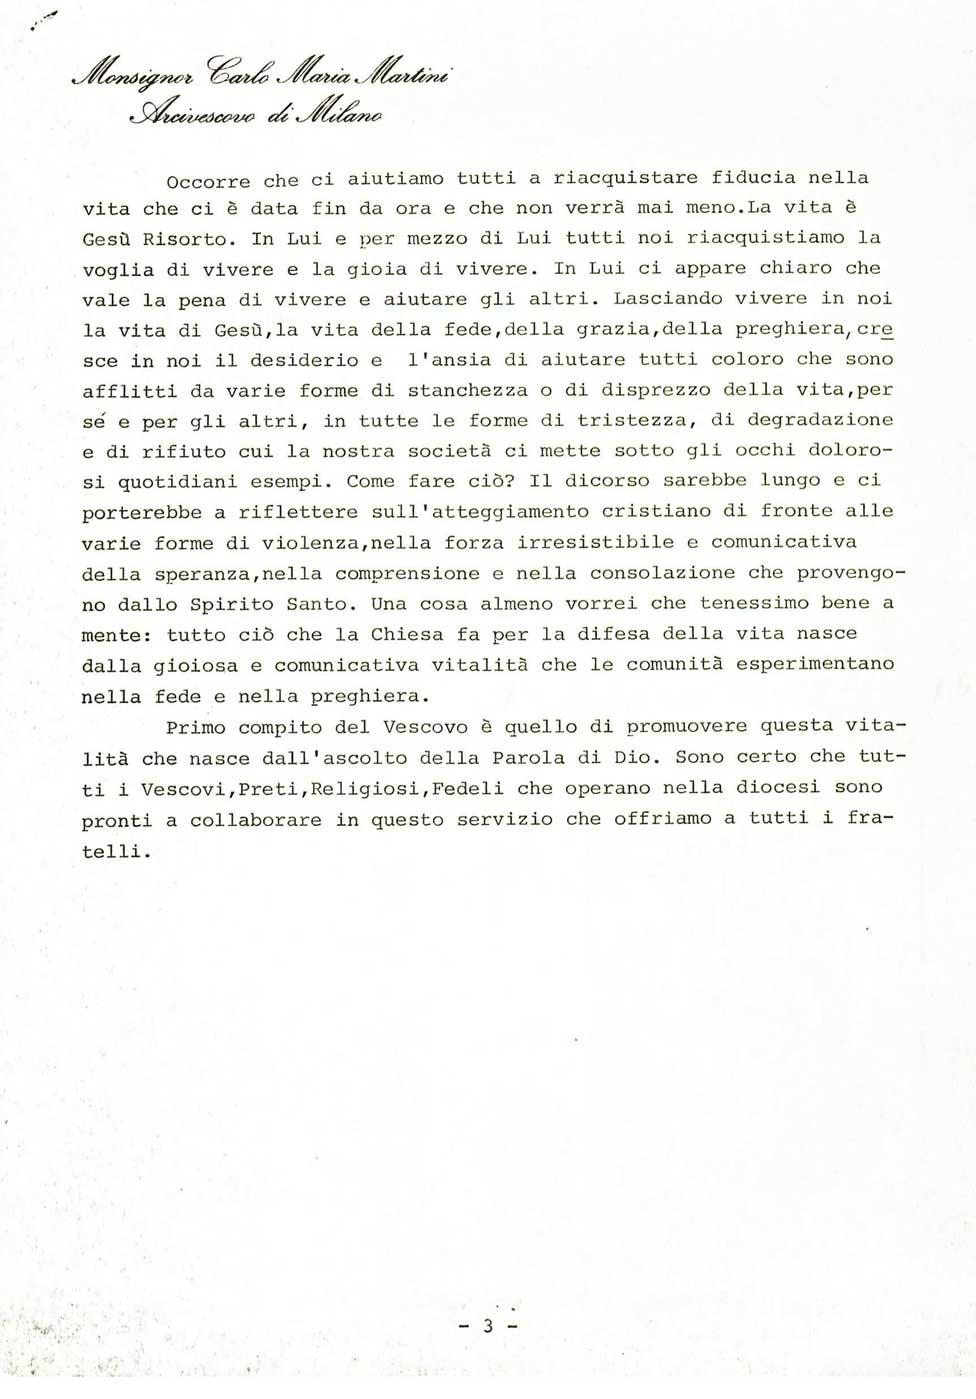 docFebbraio_03